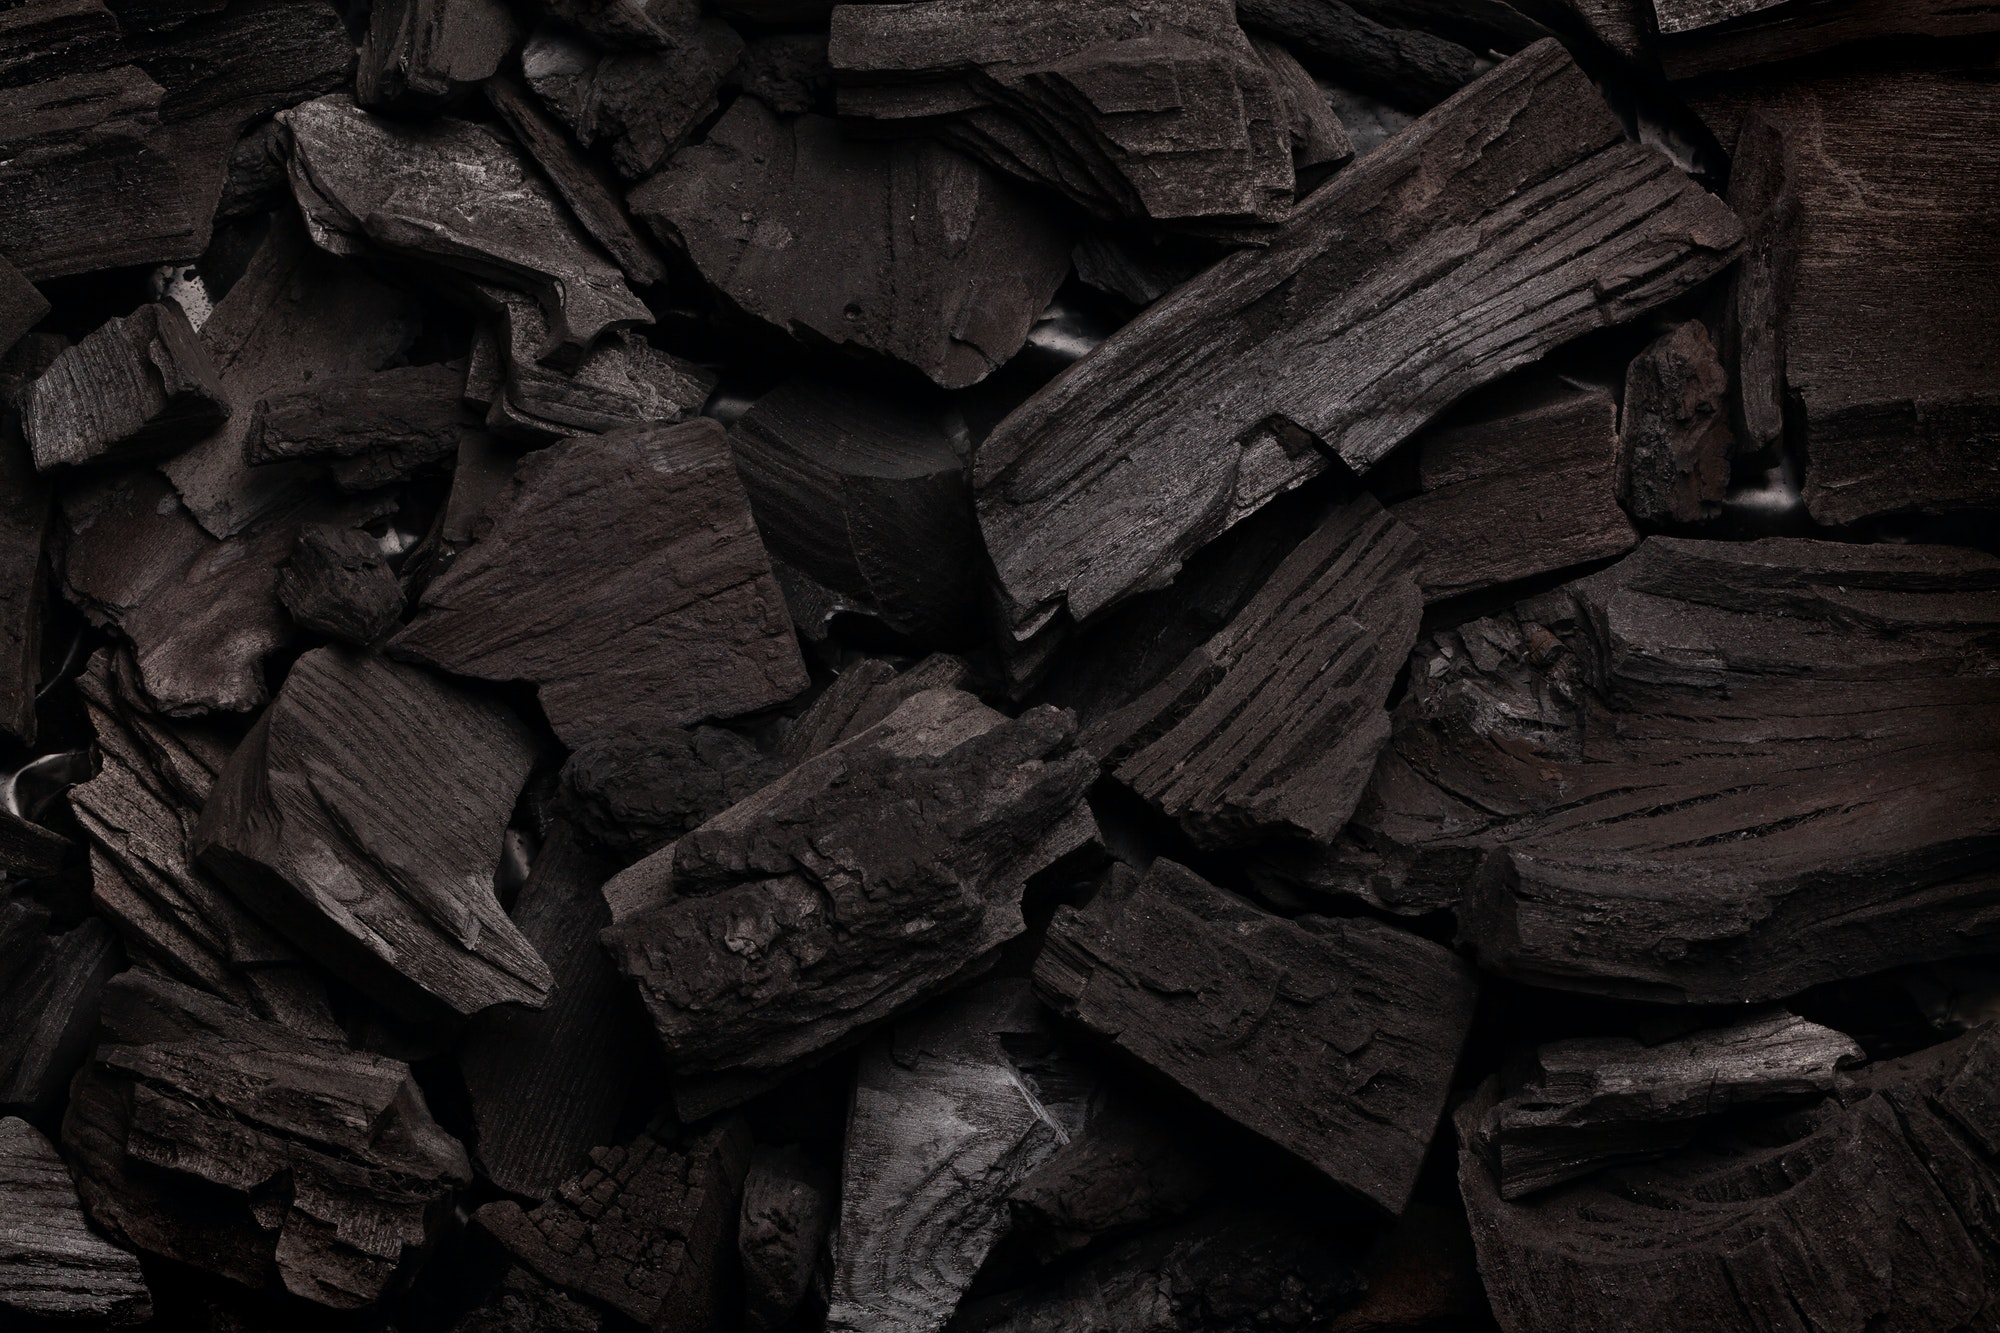 Hot coal barbecue grill backdrop